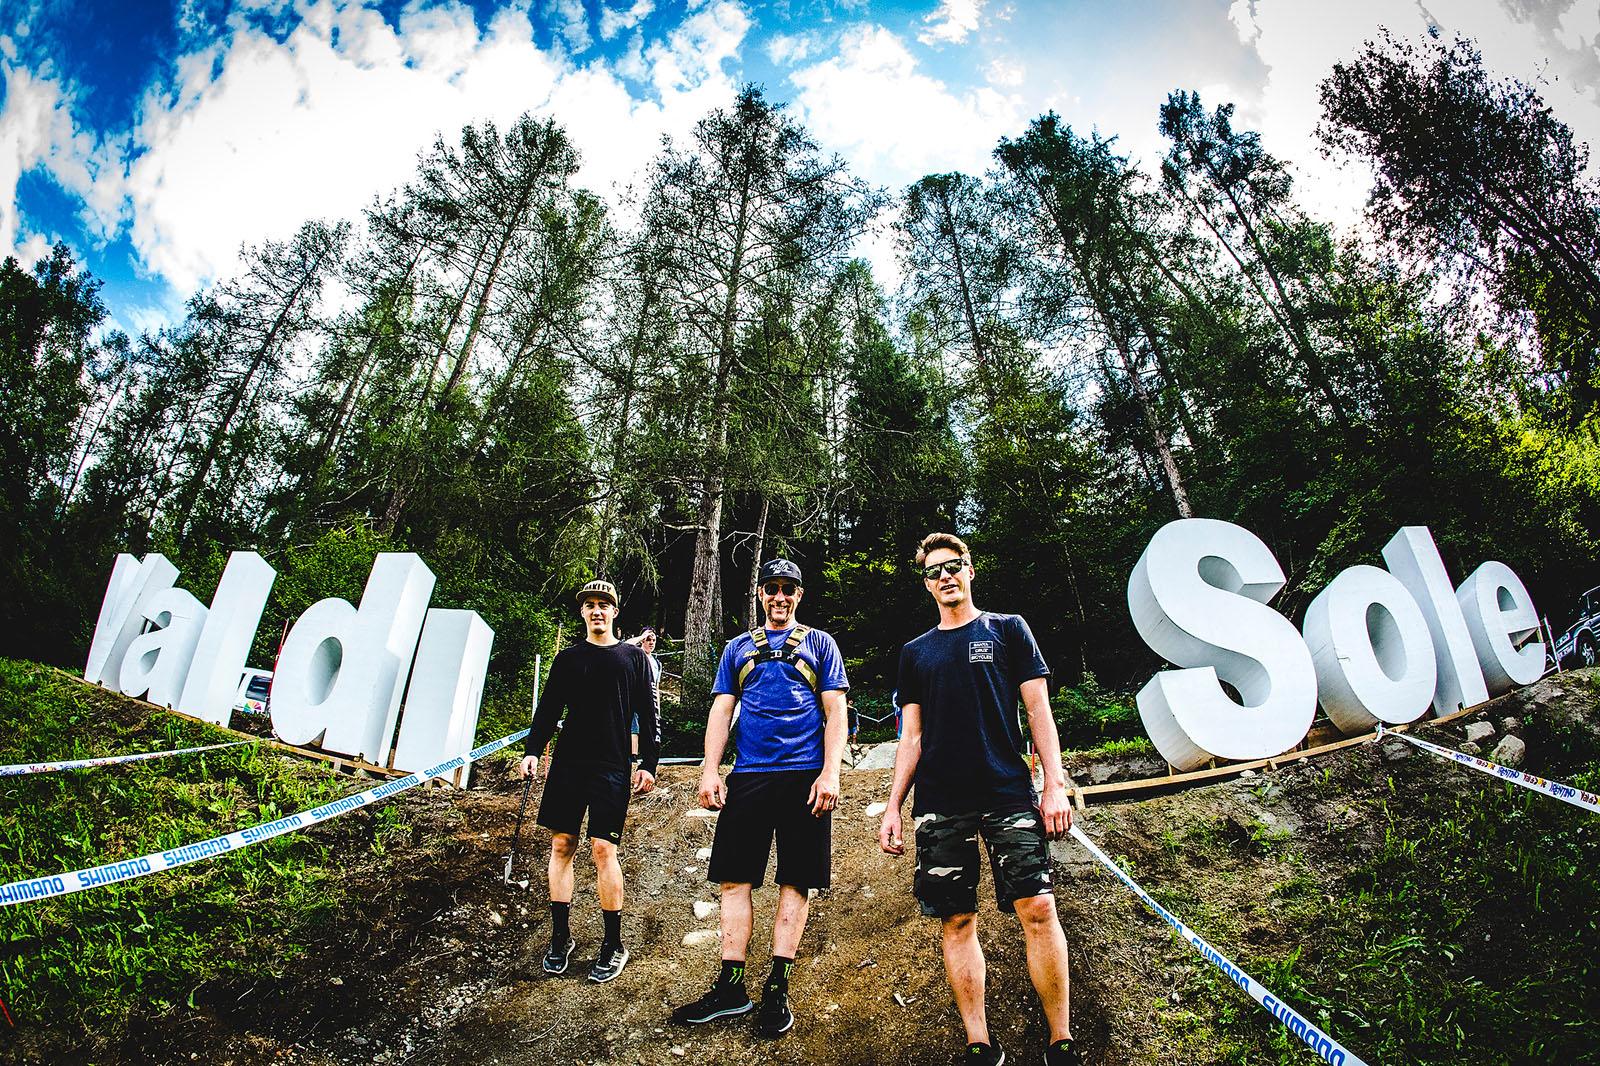 Luca Shaw, Steve Peat, and Greg Minnaar at the Val di Sole trackwalk